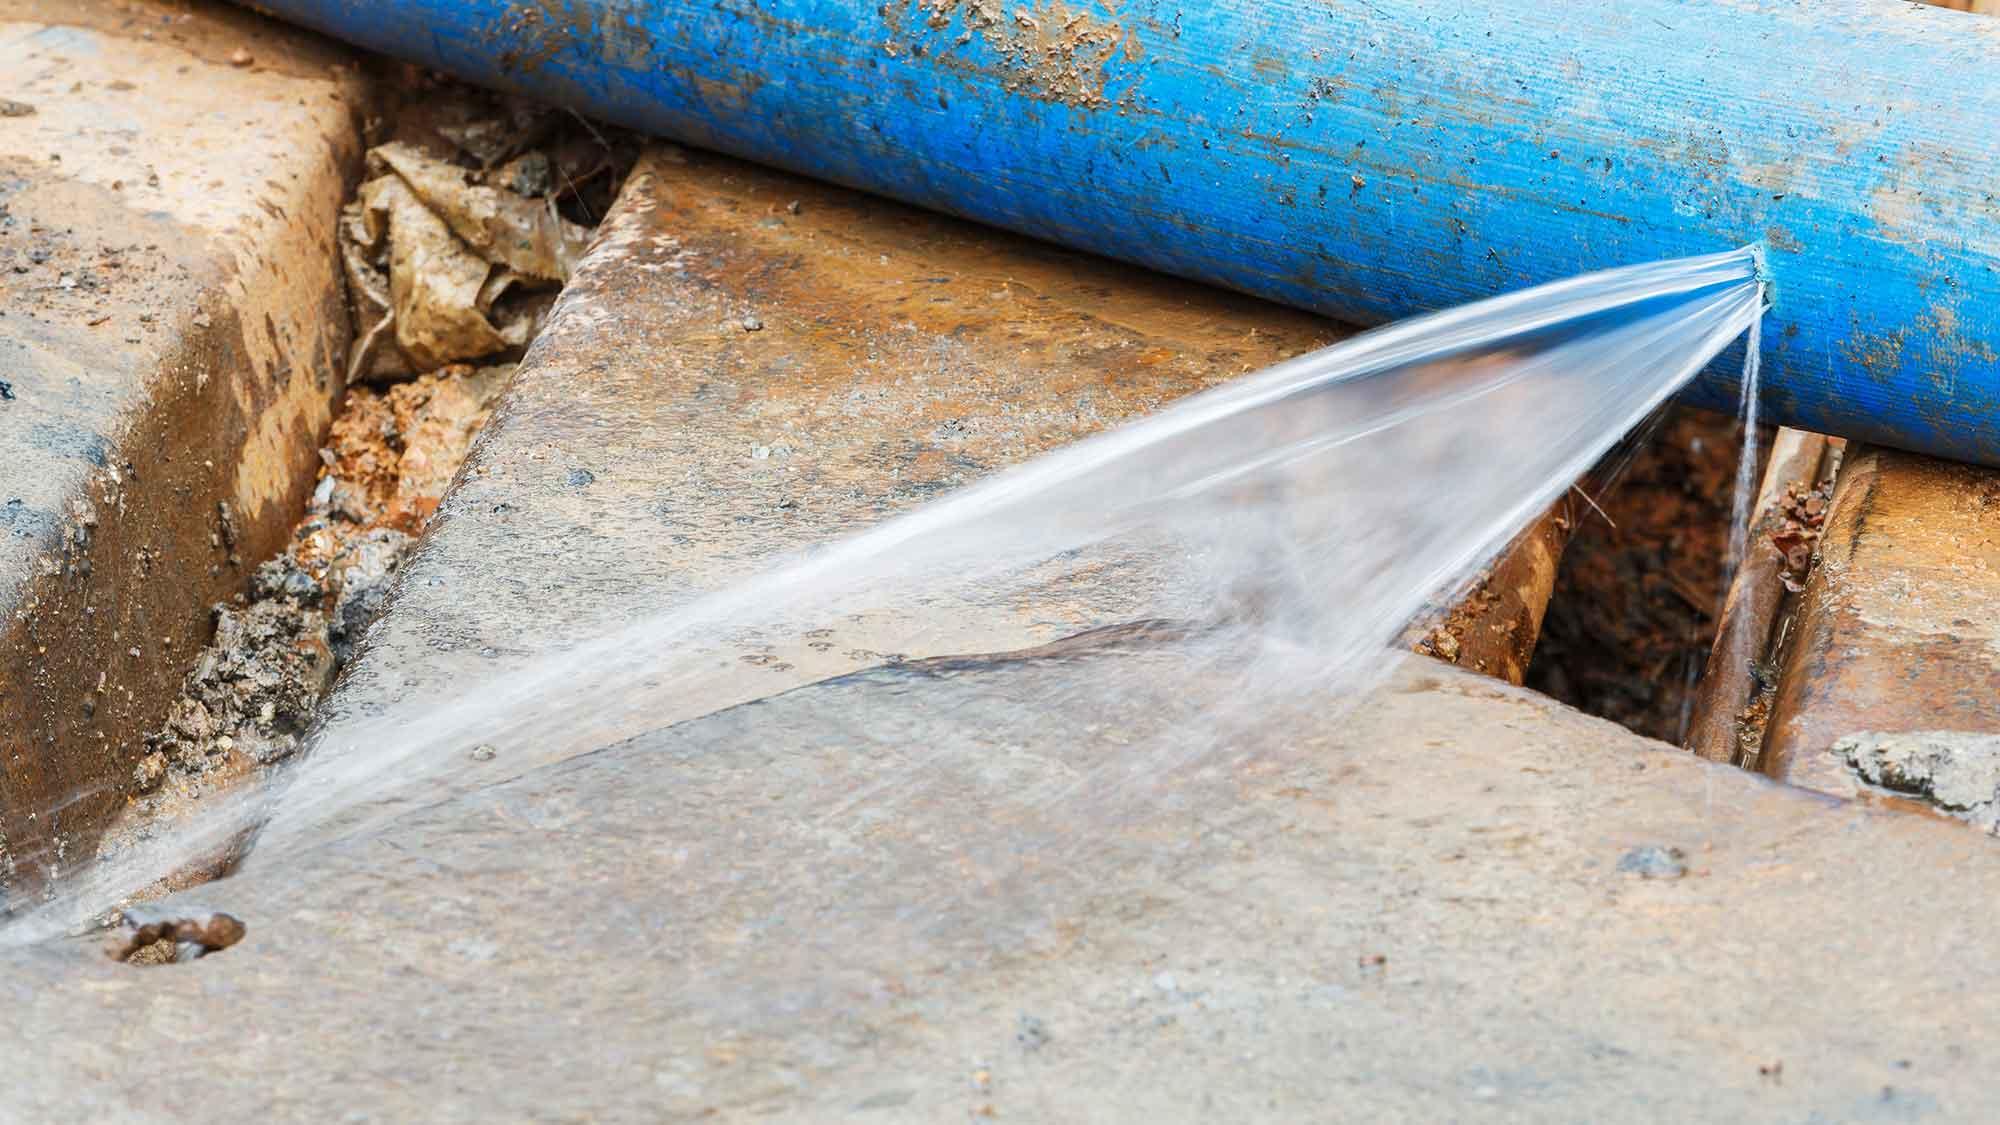 burst pipe repair essex maintenance leigh on sea tube